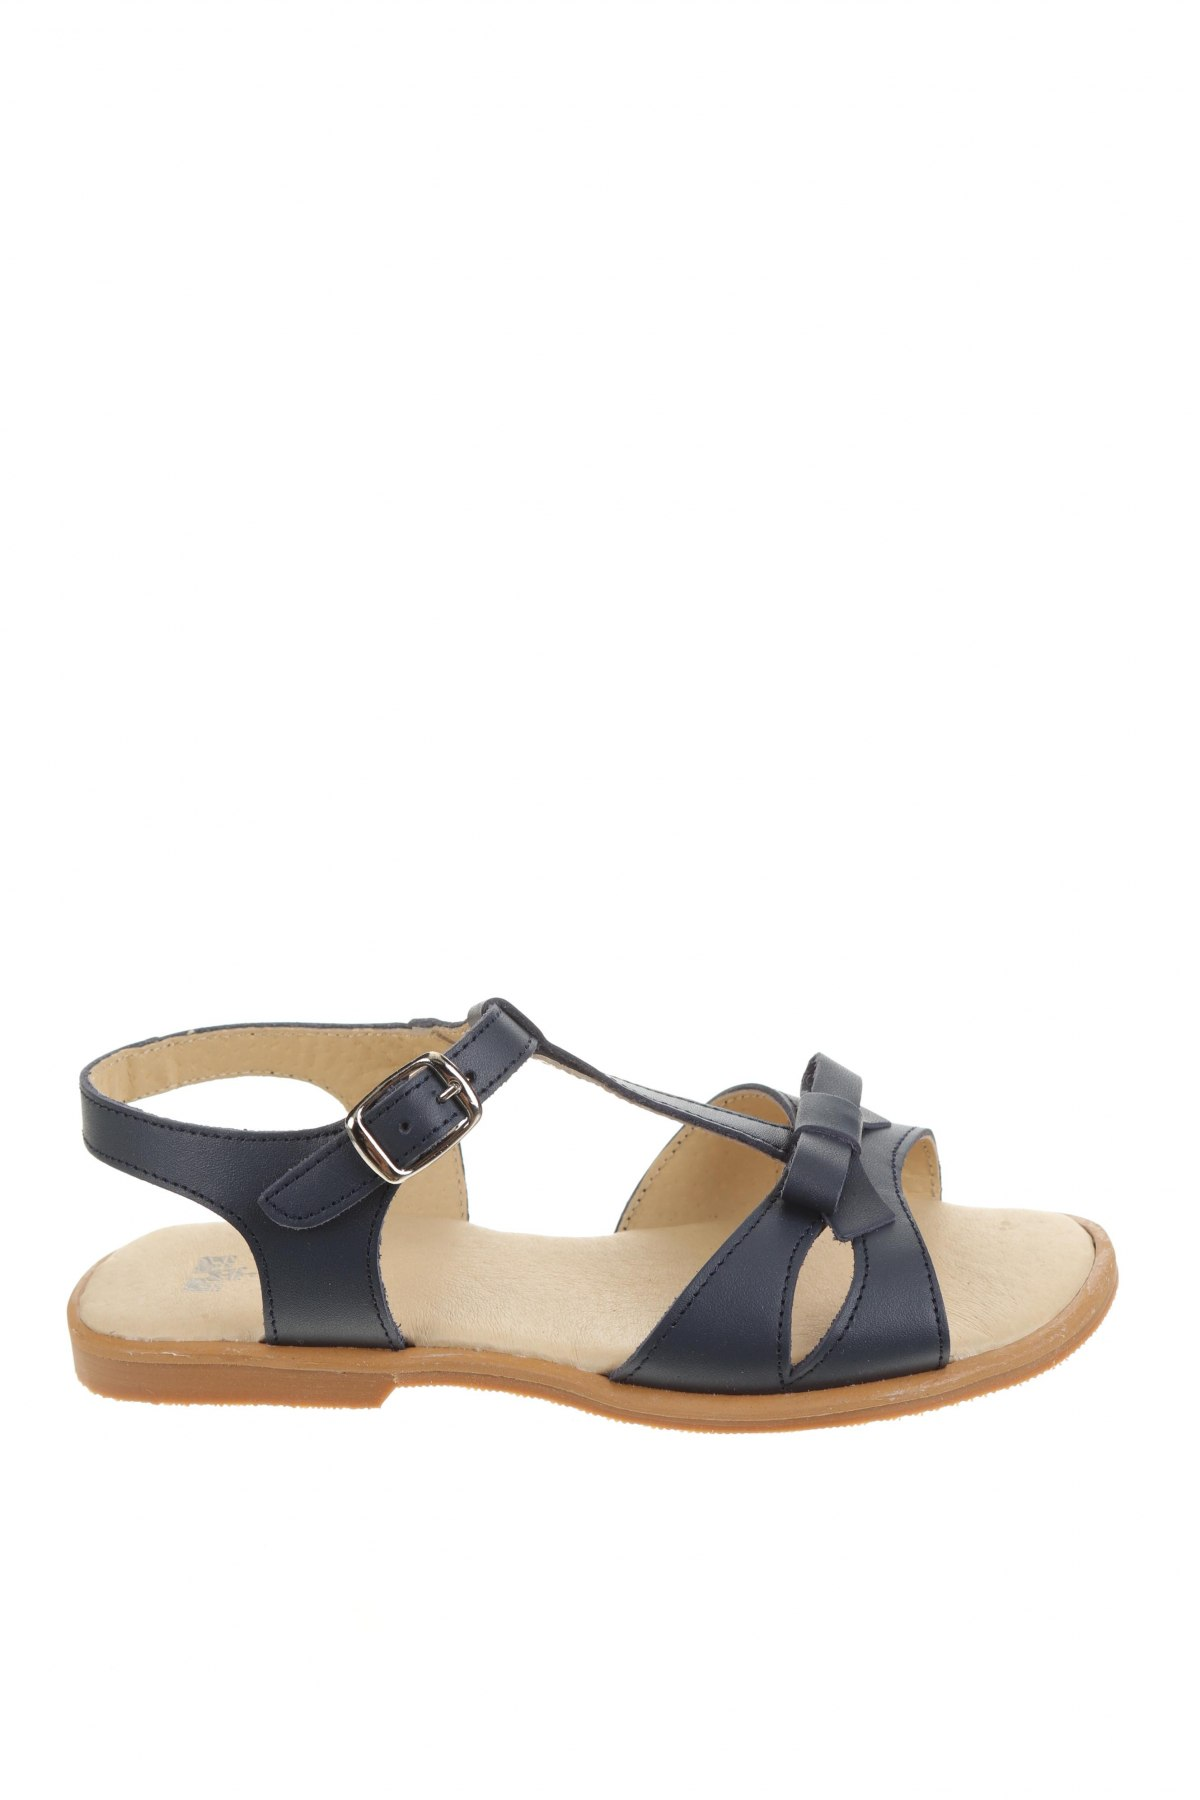 Детски сандали Lola Palacios, Размер 30, Цвят Син, Естествена кожа, Цена 59,25лв.